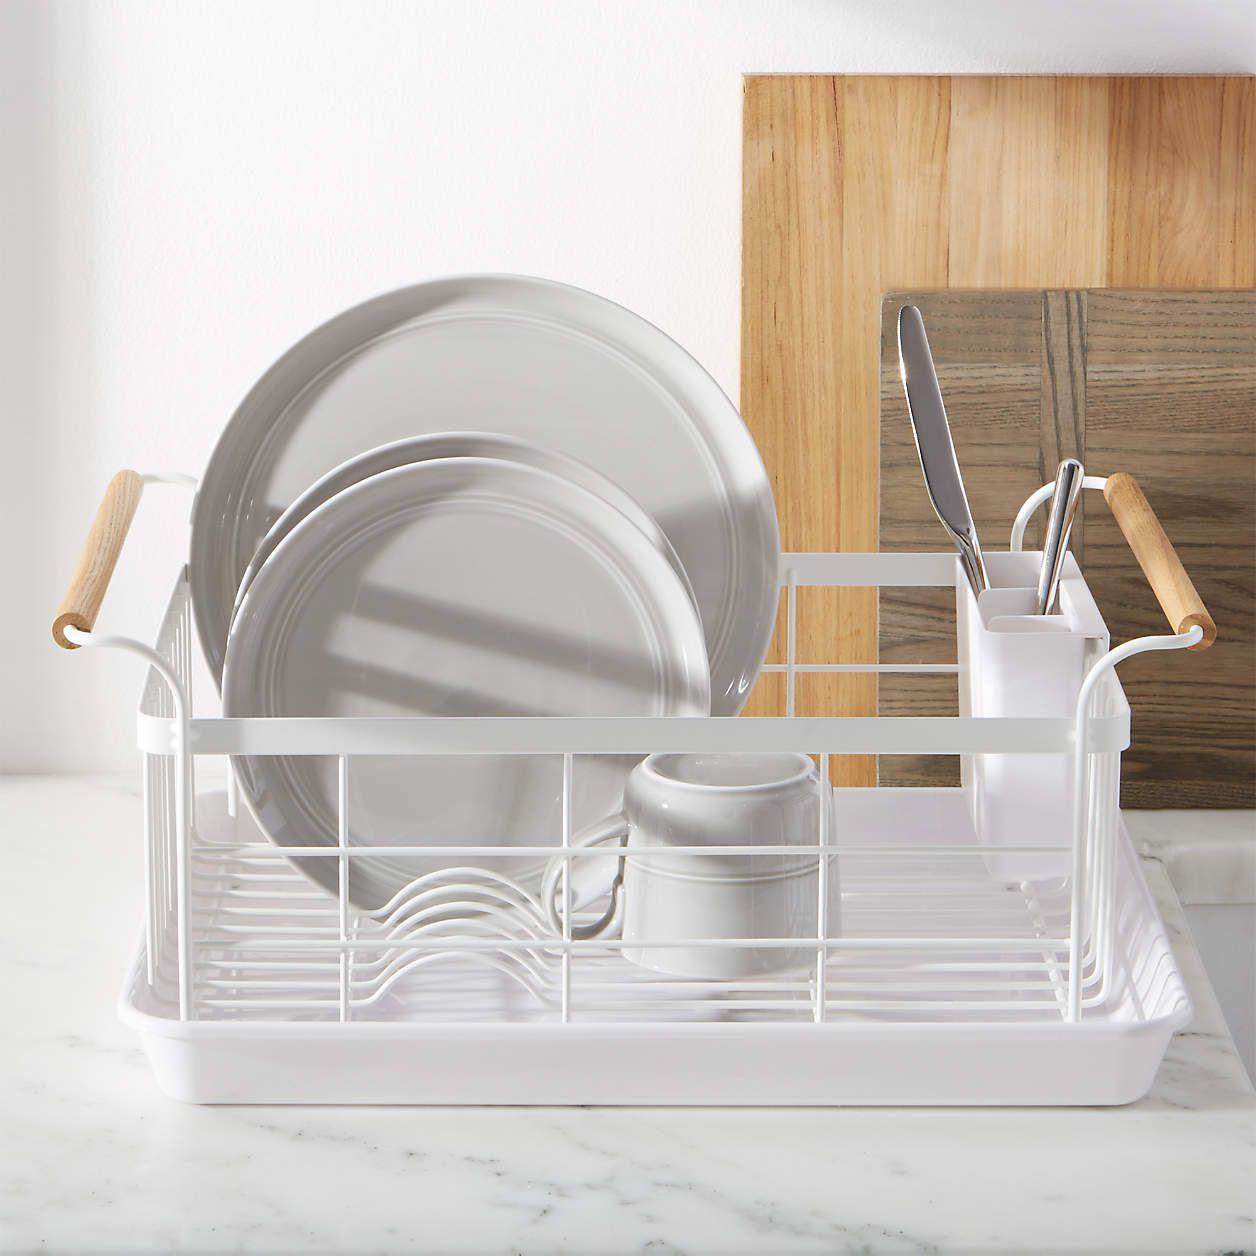 the 12 best dish drying racks of 2021